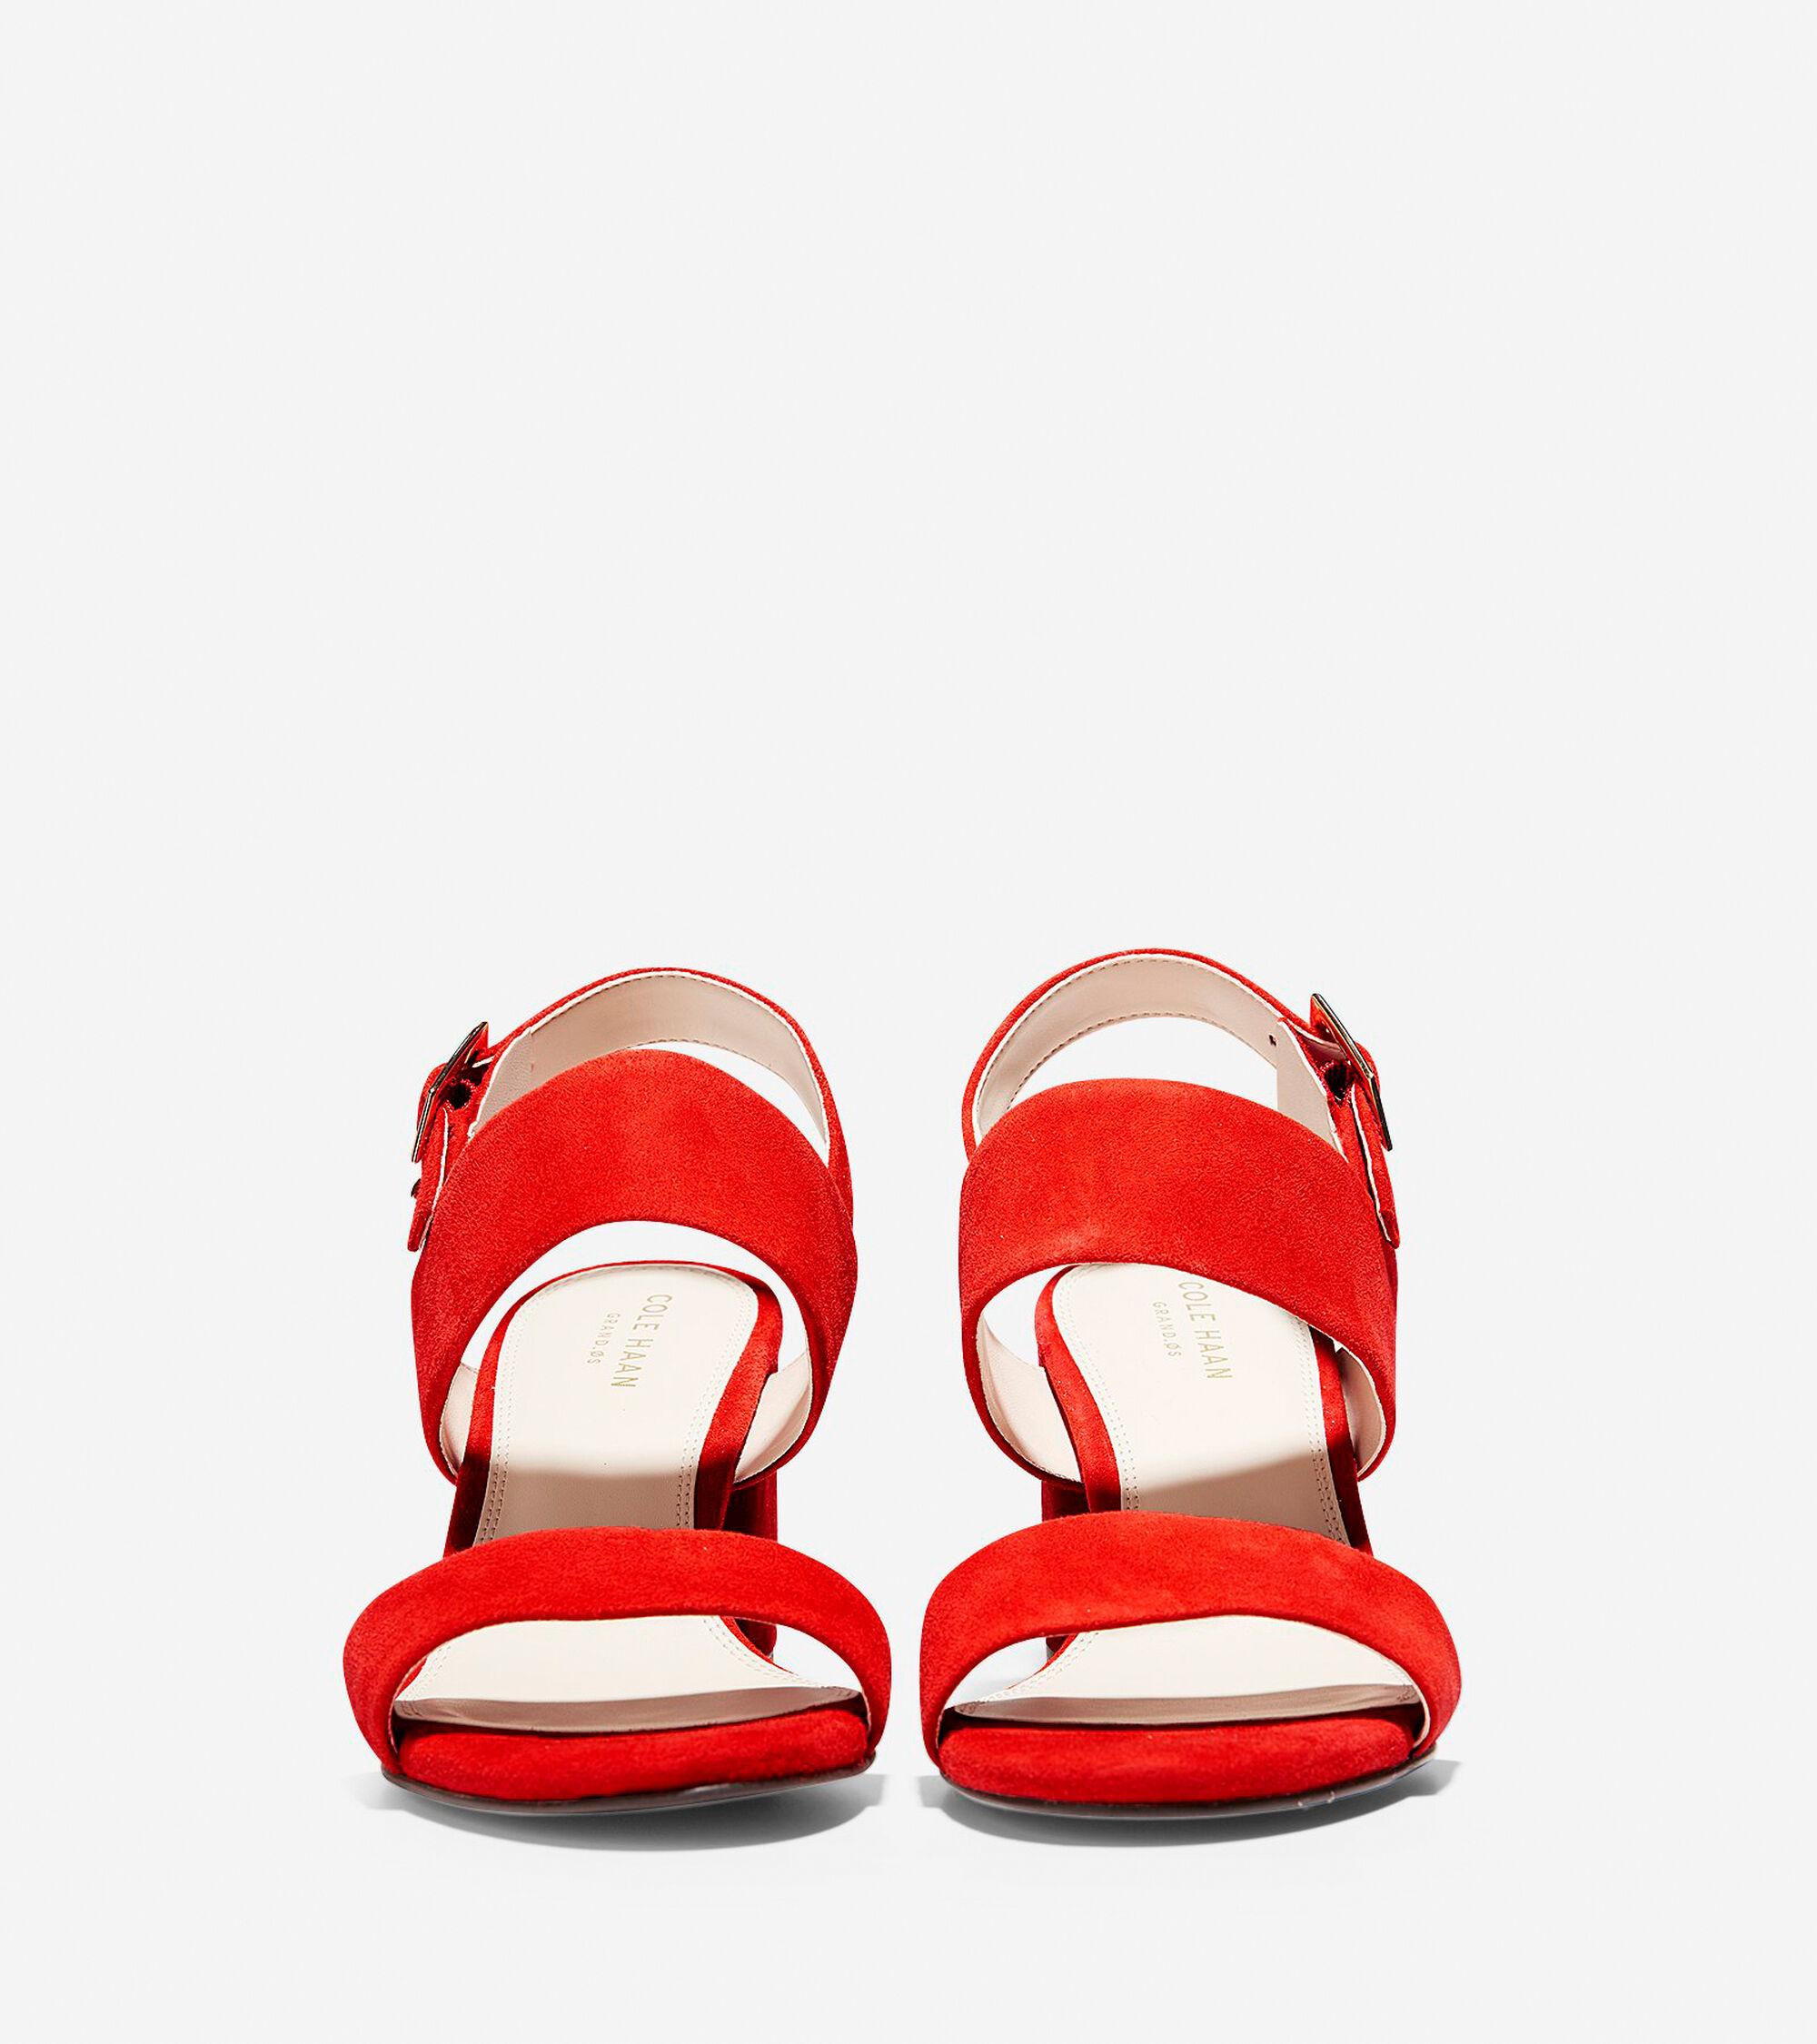 d0b15fc07d Women's Avani City Sandals 65mm in Aura Orange | Cole Haan